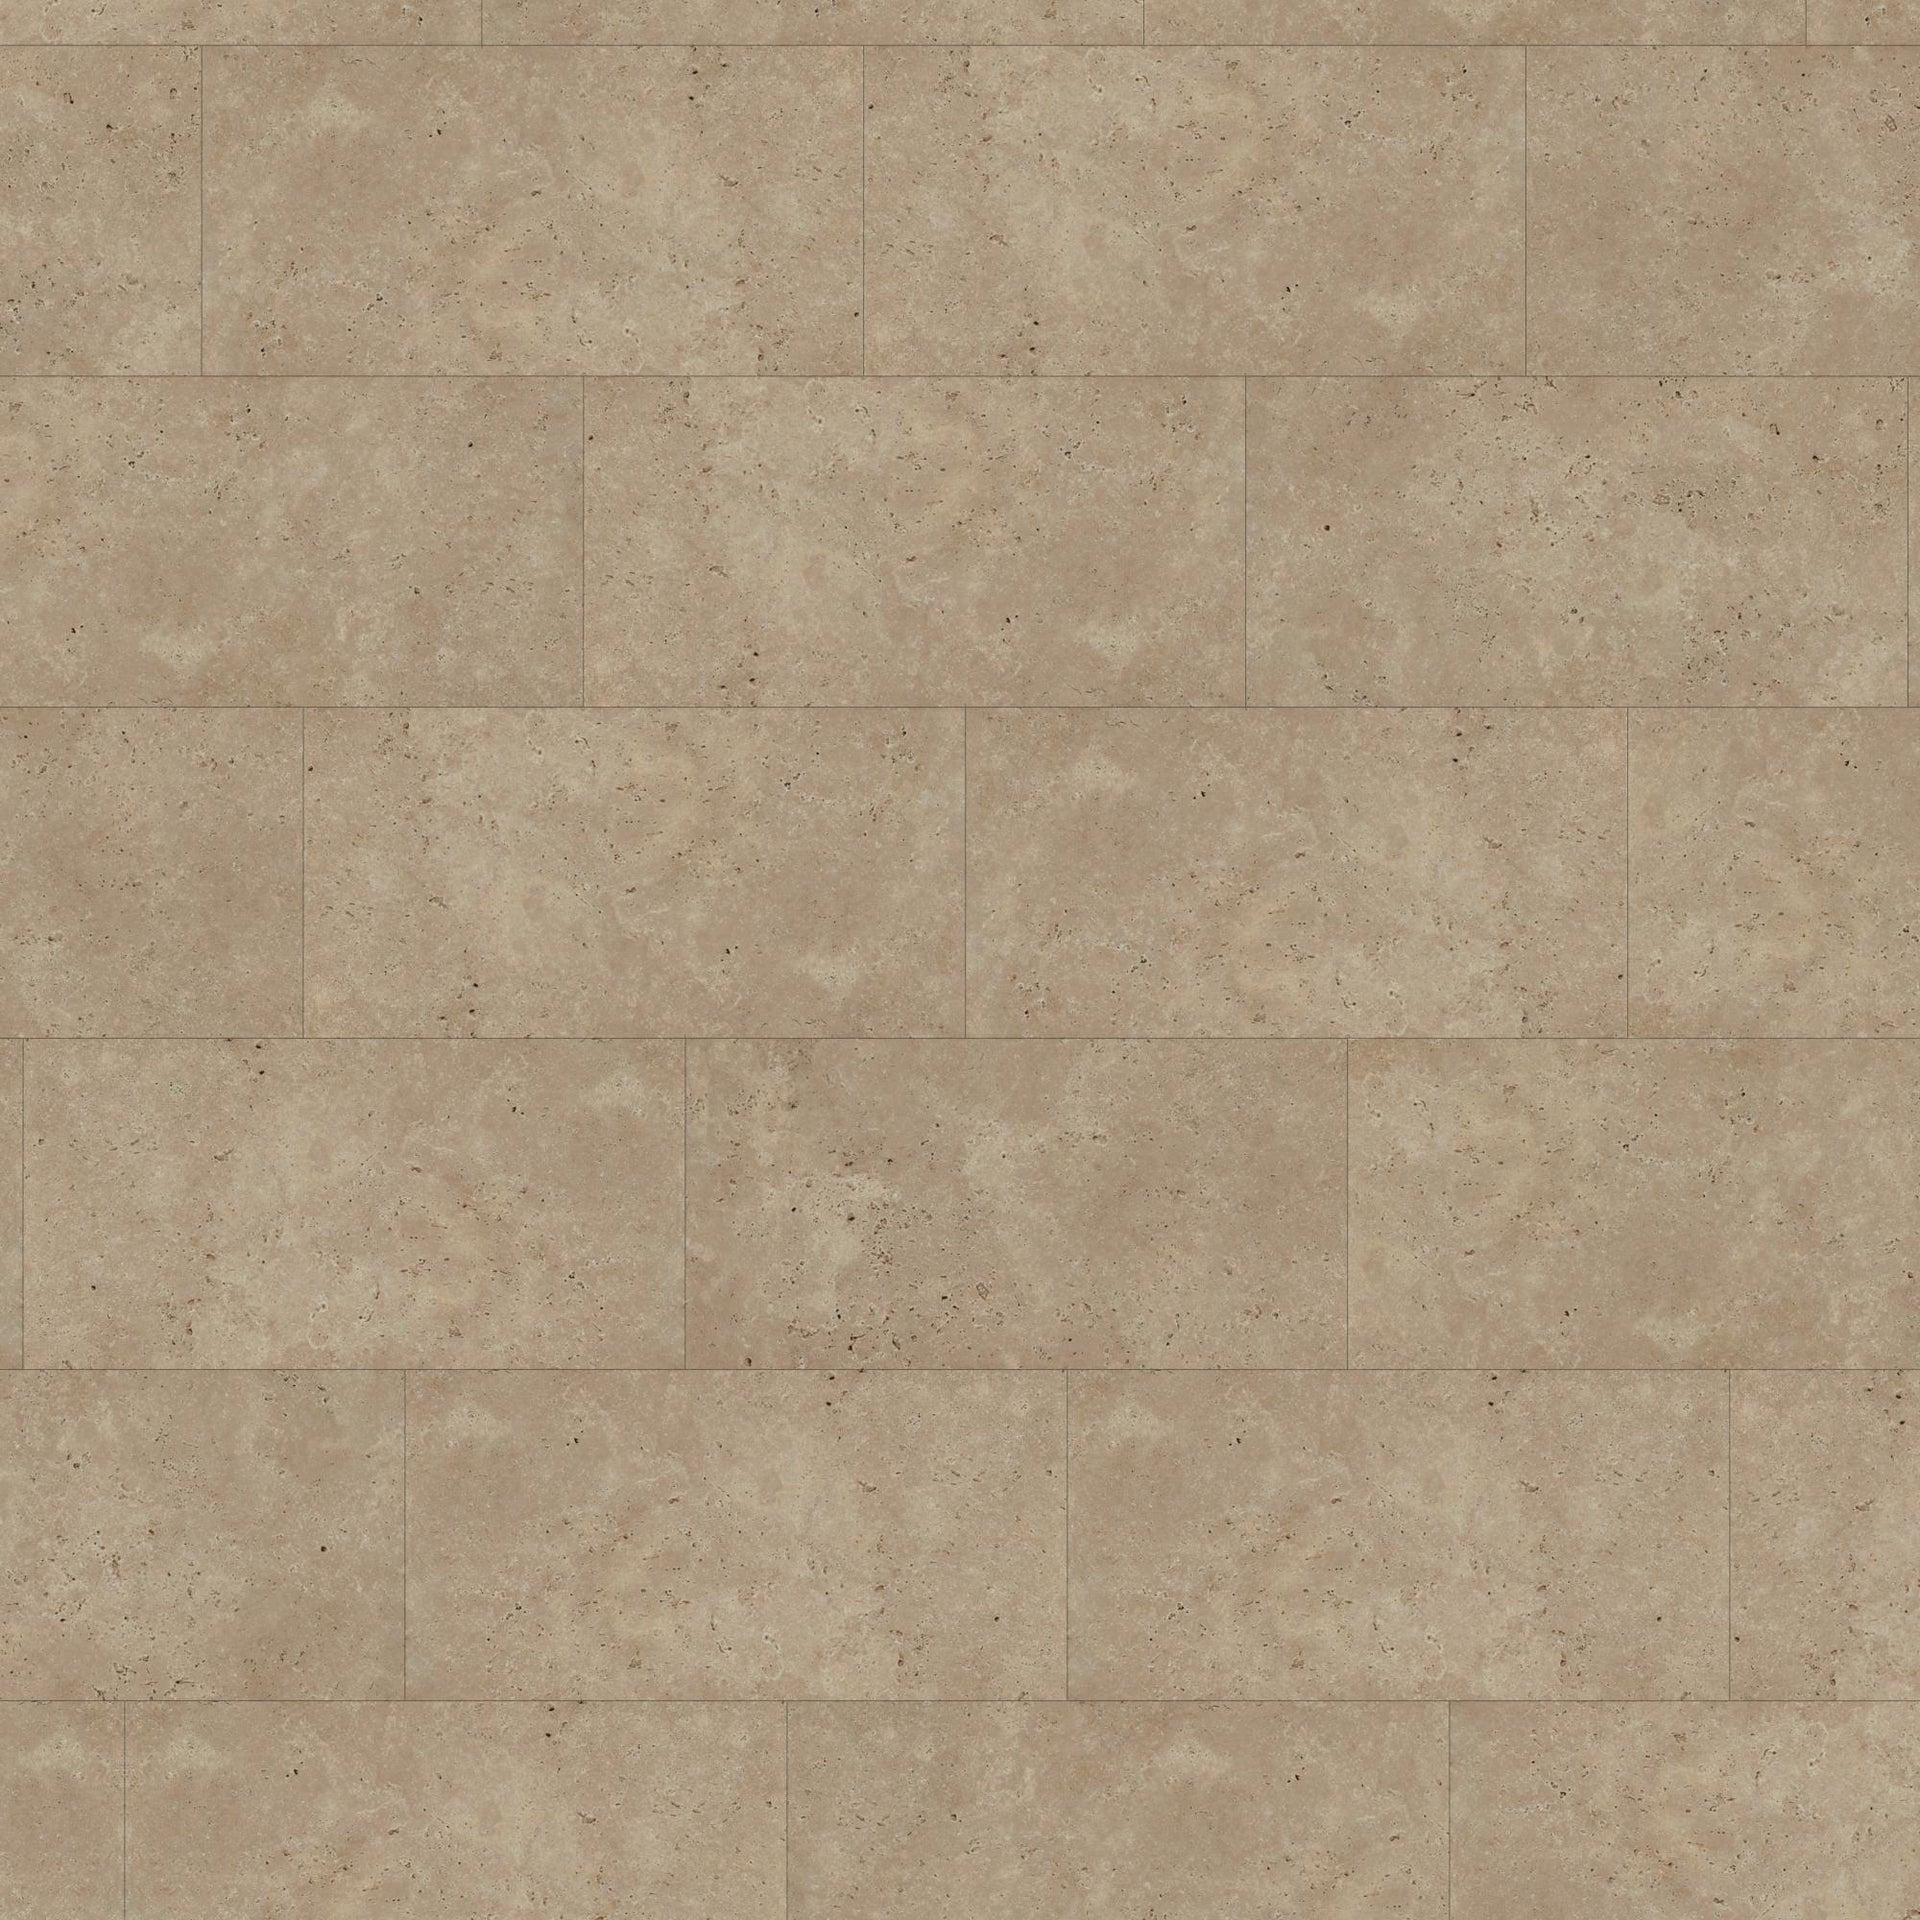 Pavimento PVC adesivo Travertino Sp 1.5 mm beige - 6